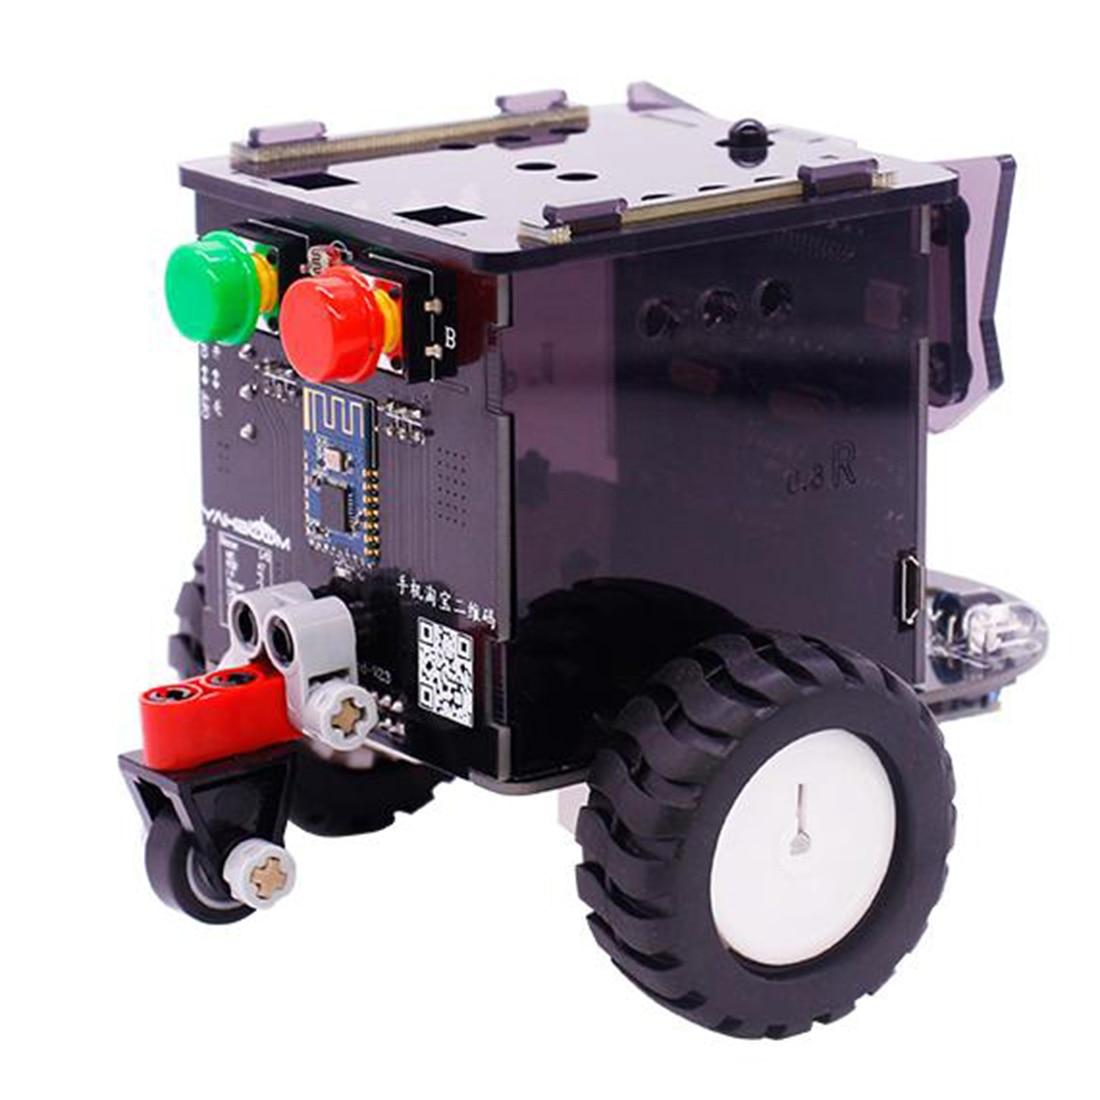 Standard Version Omibox Scratch Programmable Robot Car Kit Programable Toys For Men Kids Gift